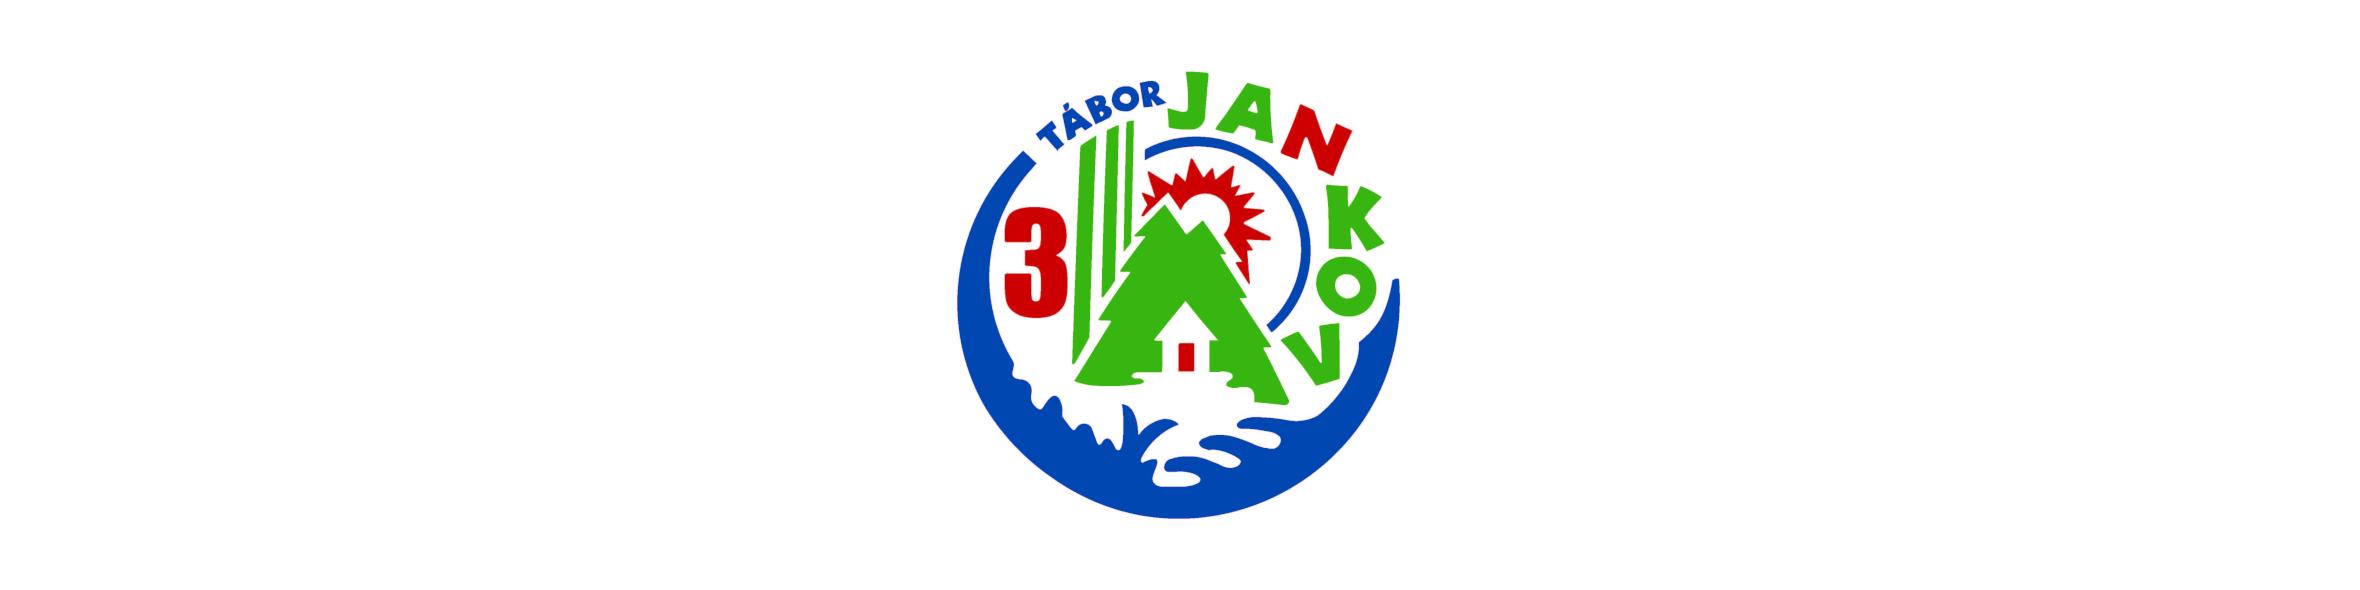 Jankov